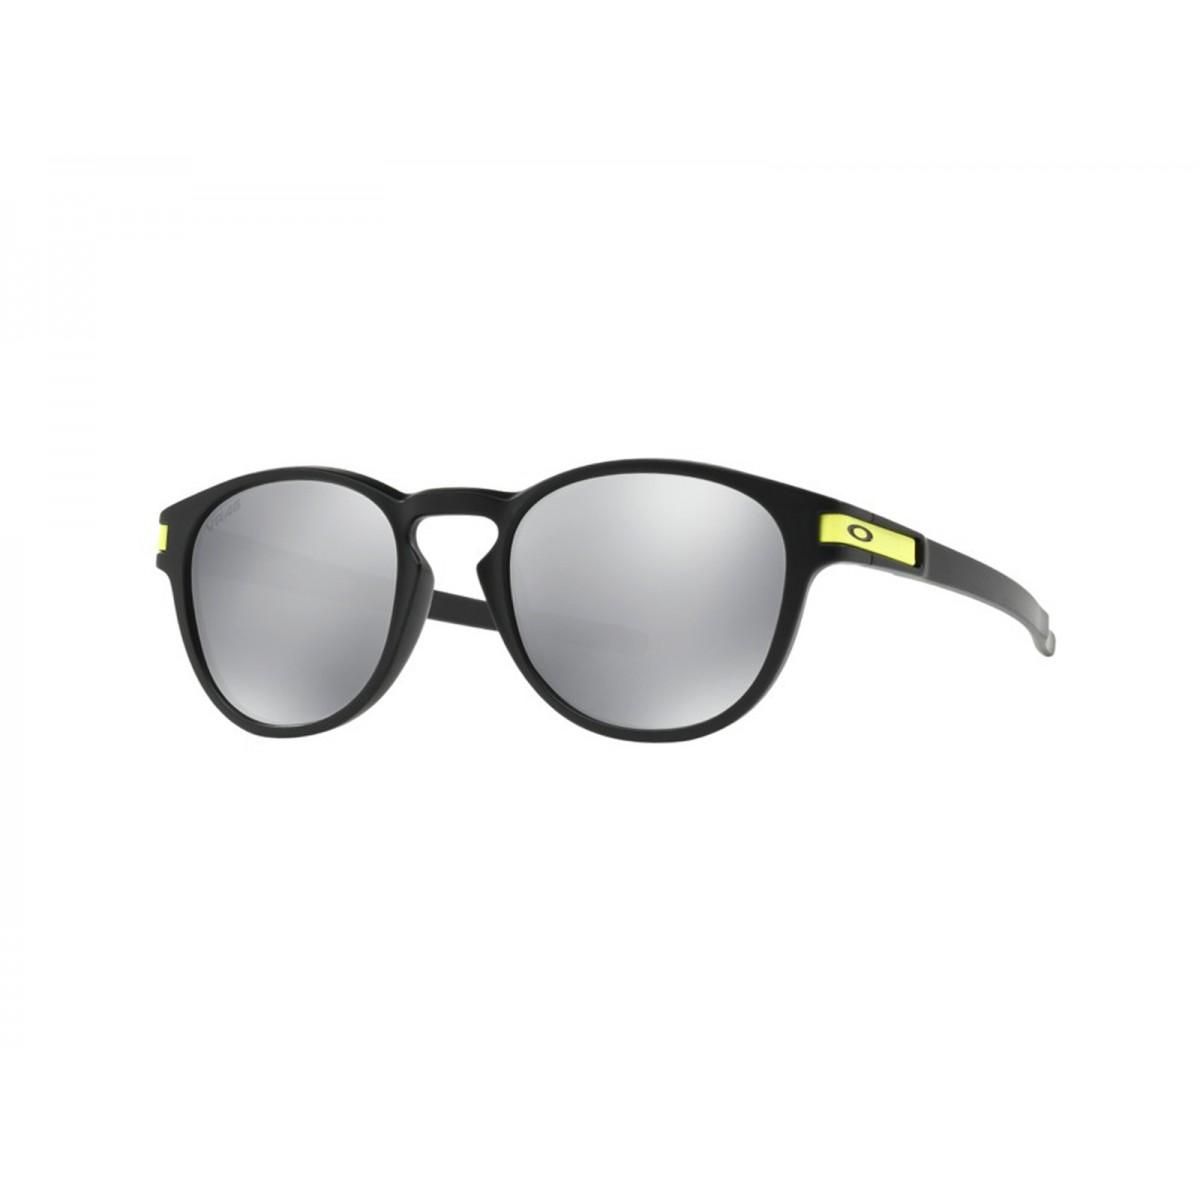 703ae26426 Oakley Latch Matte Black Men Sunglasses OK-9265-926521-53 - Sunglasses -  Fashion World